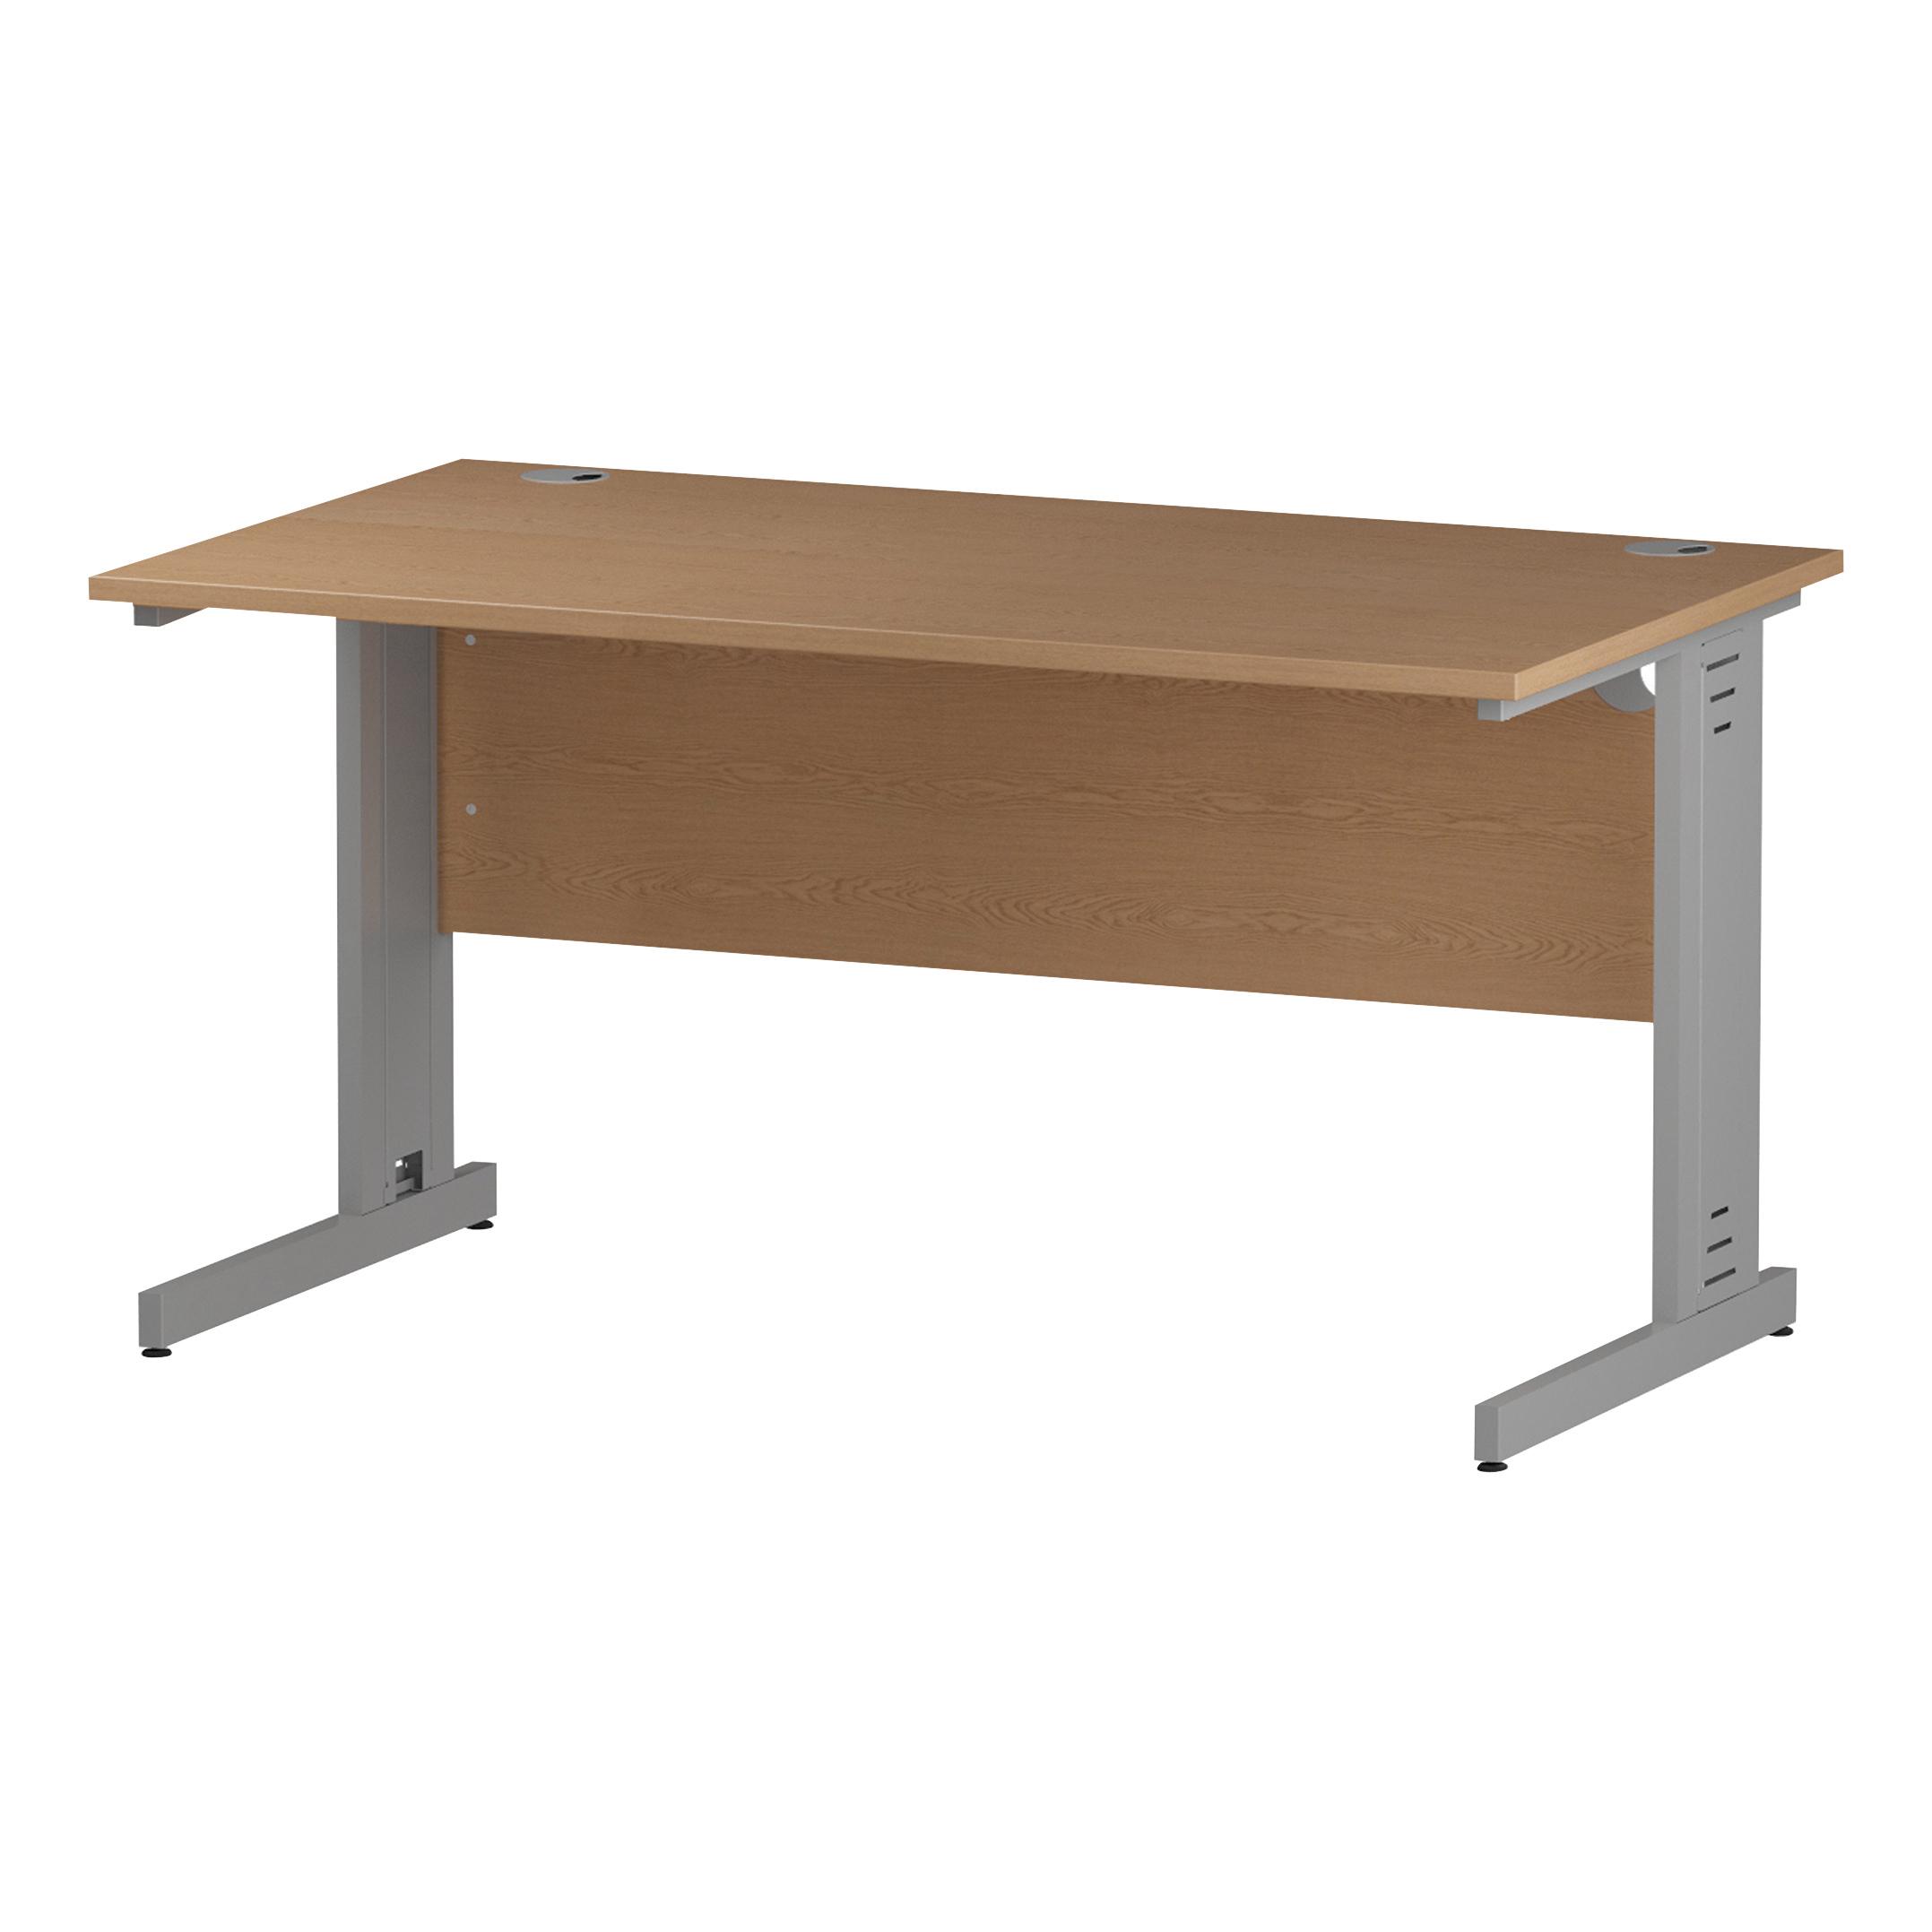 Trexus Rectangular Desk Silver Cable Managed Leg 1400x800mm Oak Ref I000851